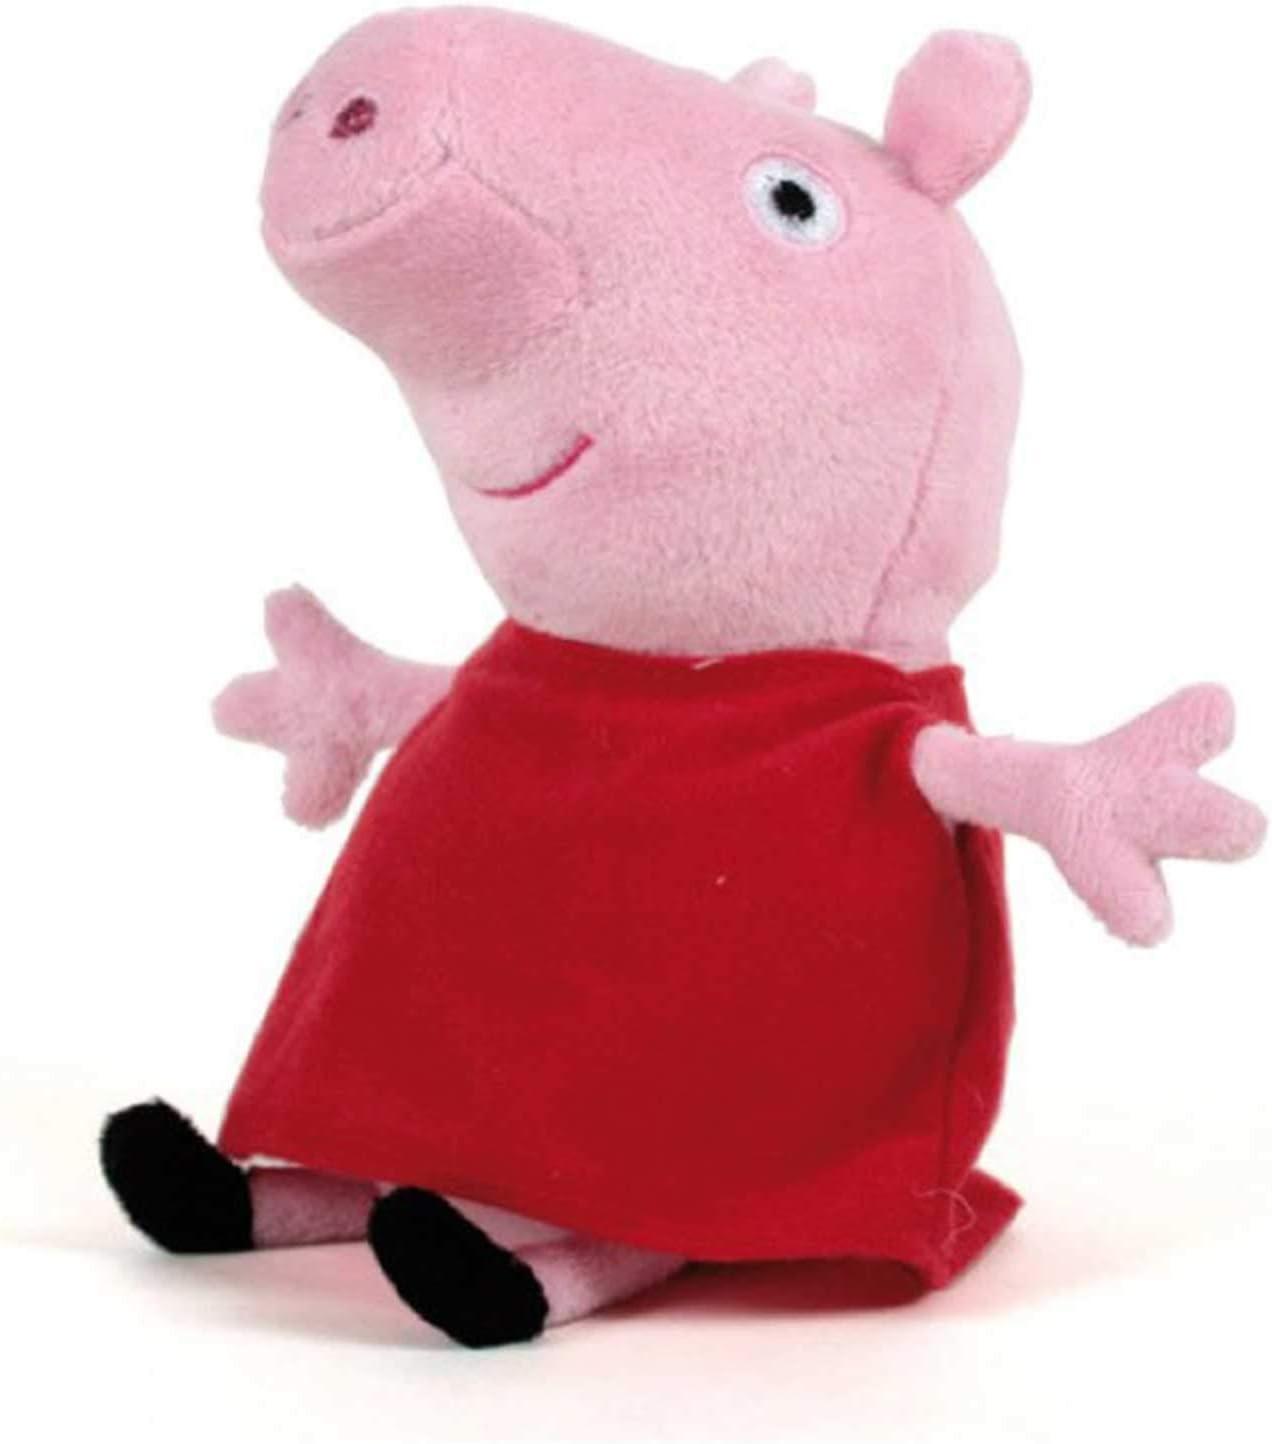 JT Peppa Pig Peluche Peppa Wutz - Peppa Pig